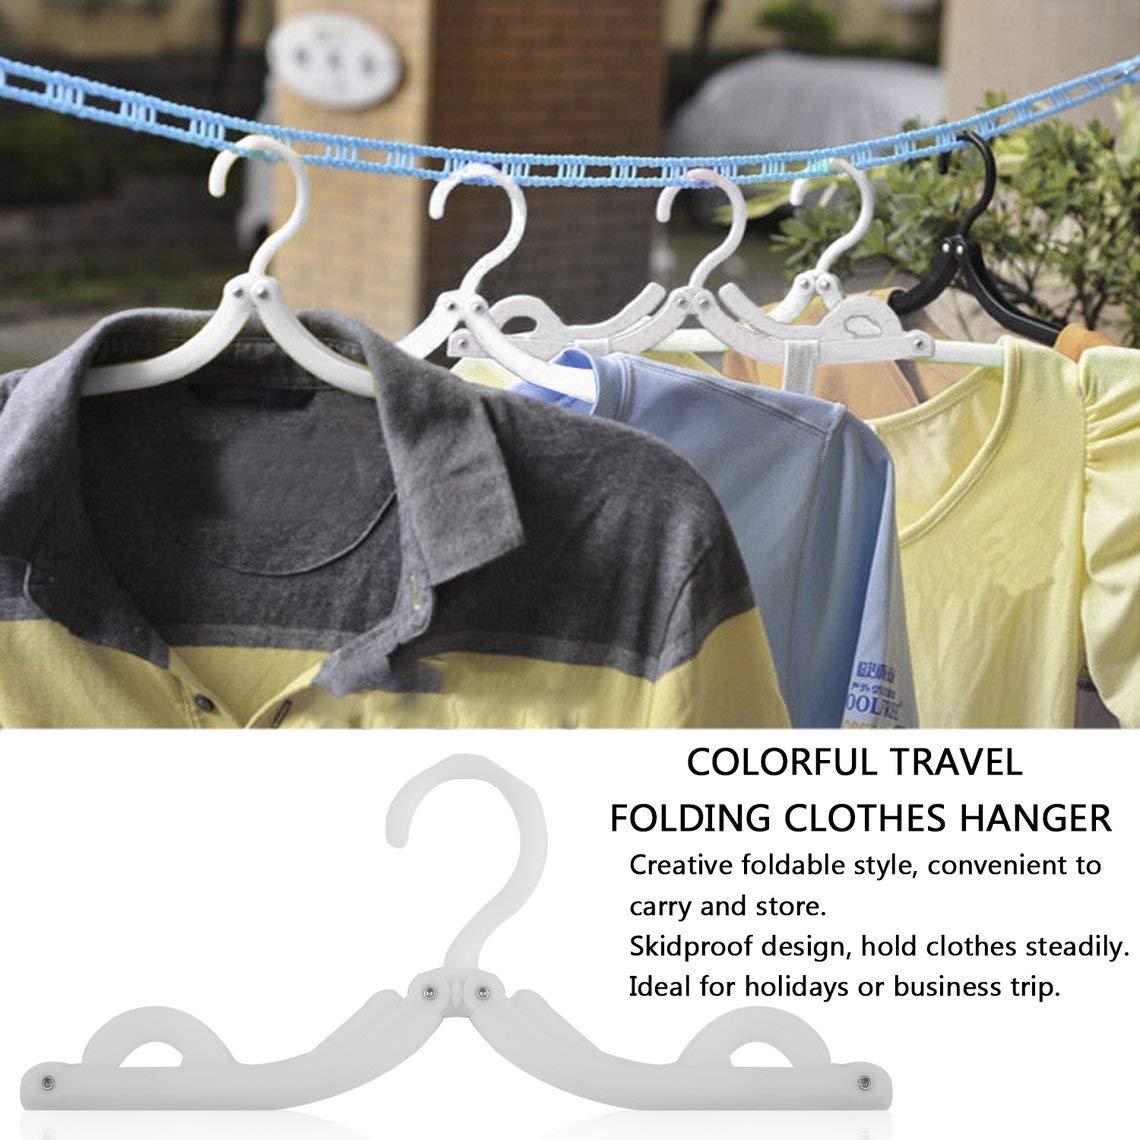 Color: Amarillo Momorain Perchero Plegable Perchero Plegable Plegable Pl/ástico para Viajes Vacaciones Durable Percha para Ropa con Estilo